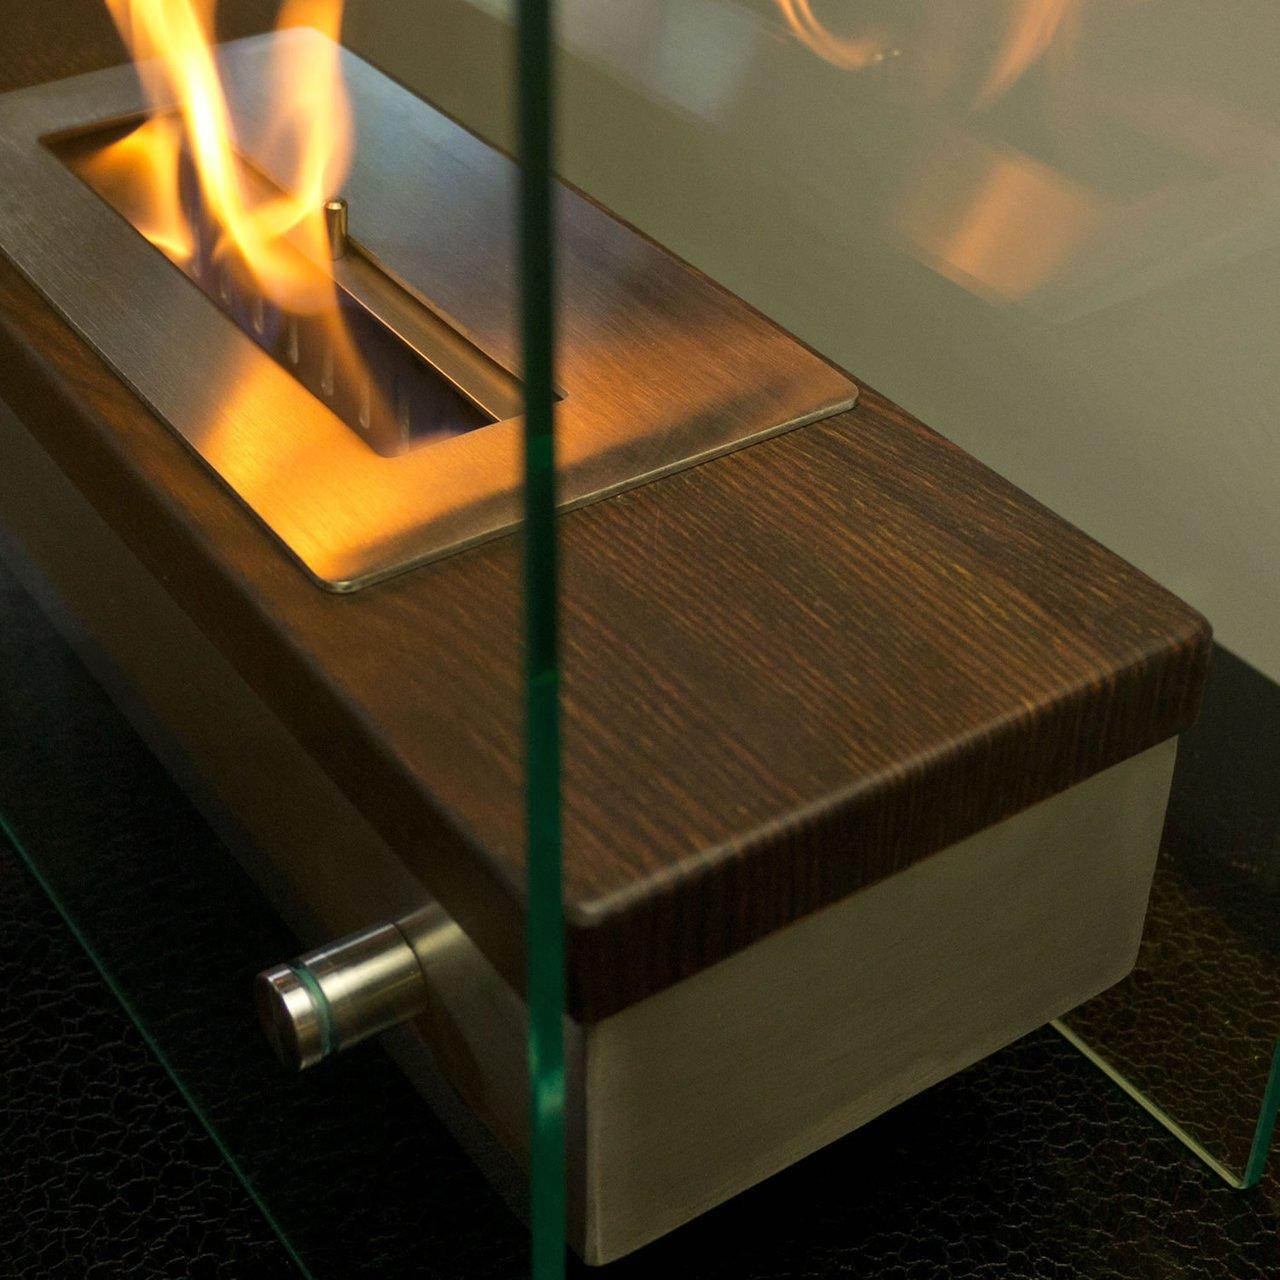 amazoncom nuflame ardore foreste tabletop fireplace nuflame home u0026 kitchen